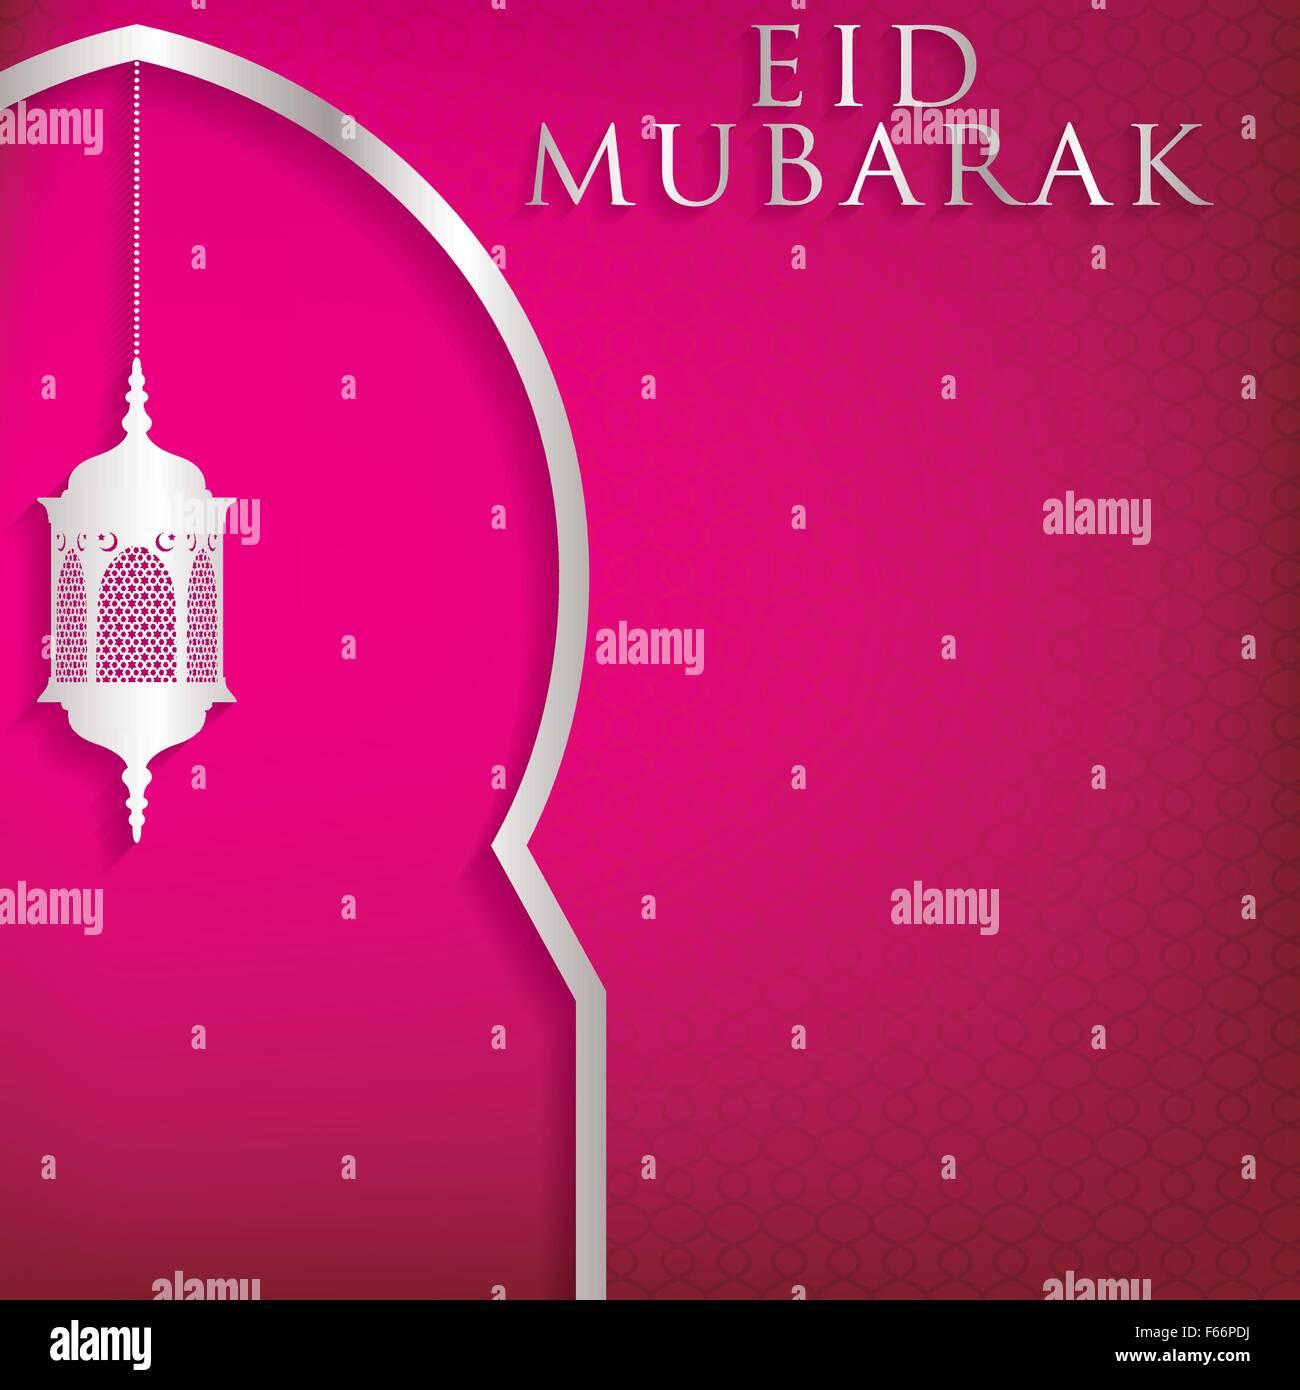 Eid mubarak blessed eid window and lantern card in vector eid mubarak blessed eid window and lantern card in vector format kristyandbryce Image collections